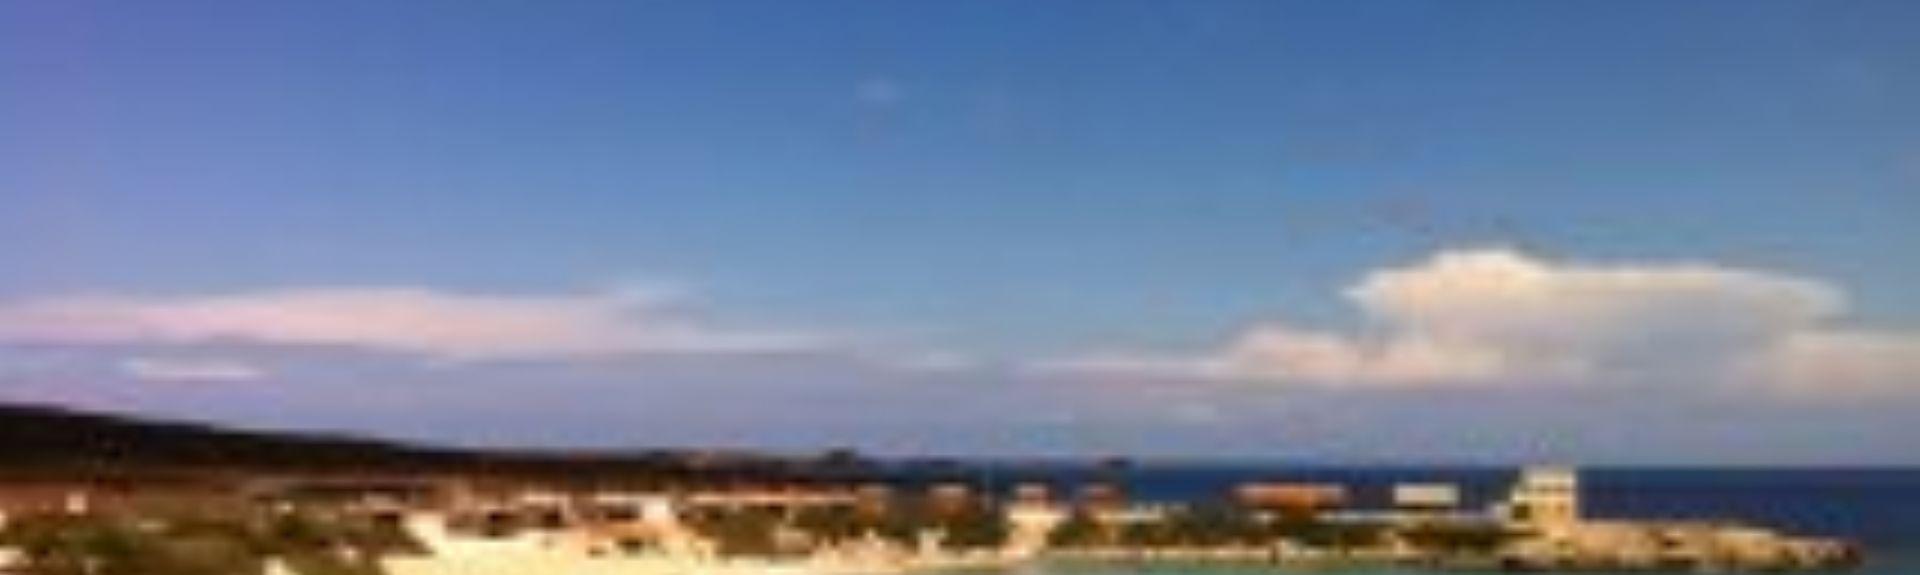 Bahceli, Chipre